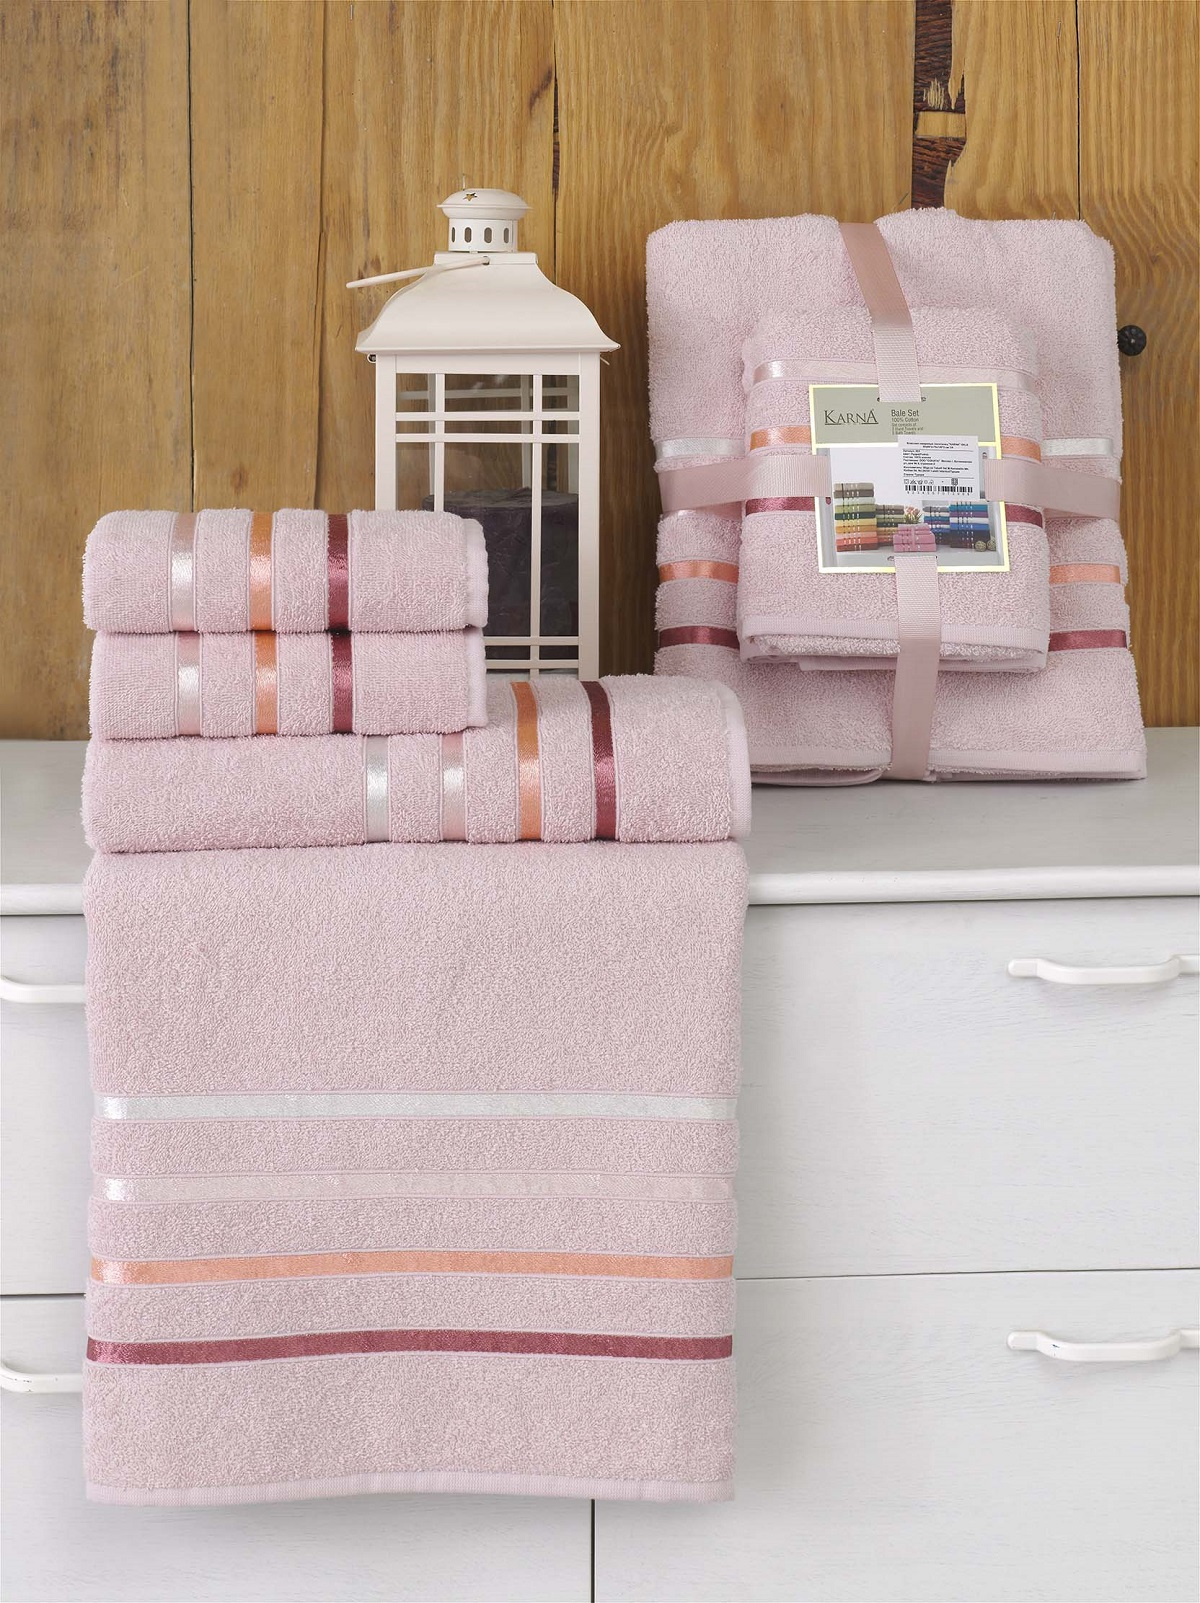 Полотенца Karna Полотенце Bale Цвет: Светло-Розовый (Набор) полотенца karna полотенце bale цвет розовый набор